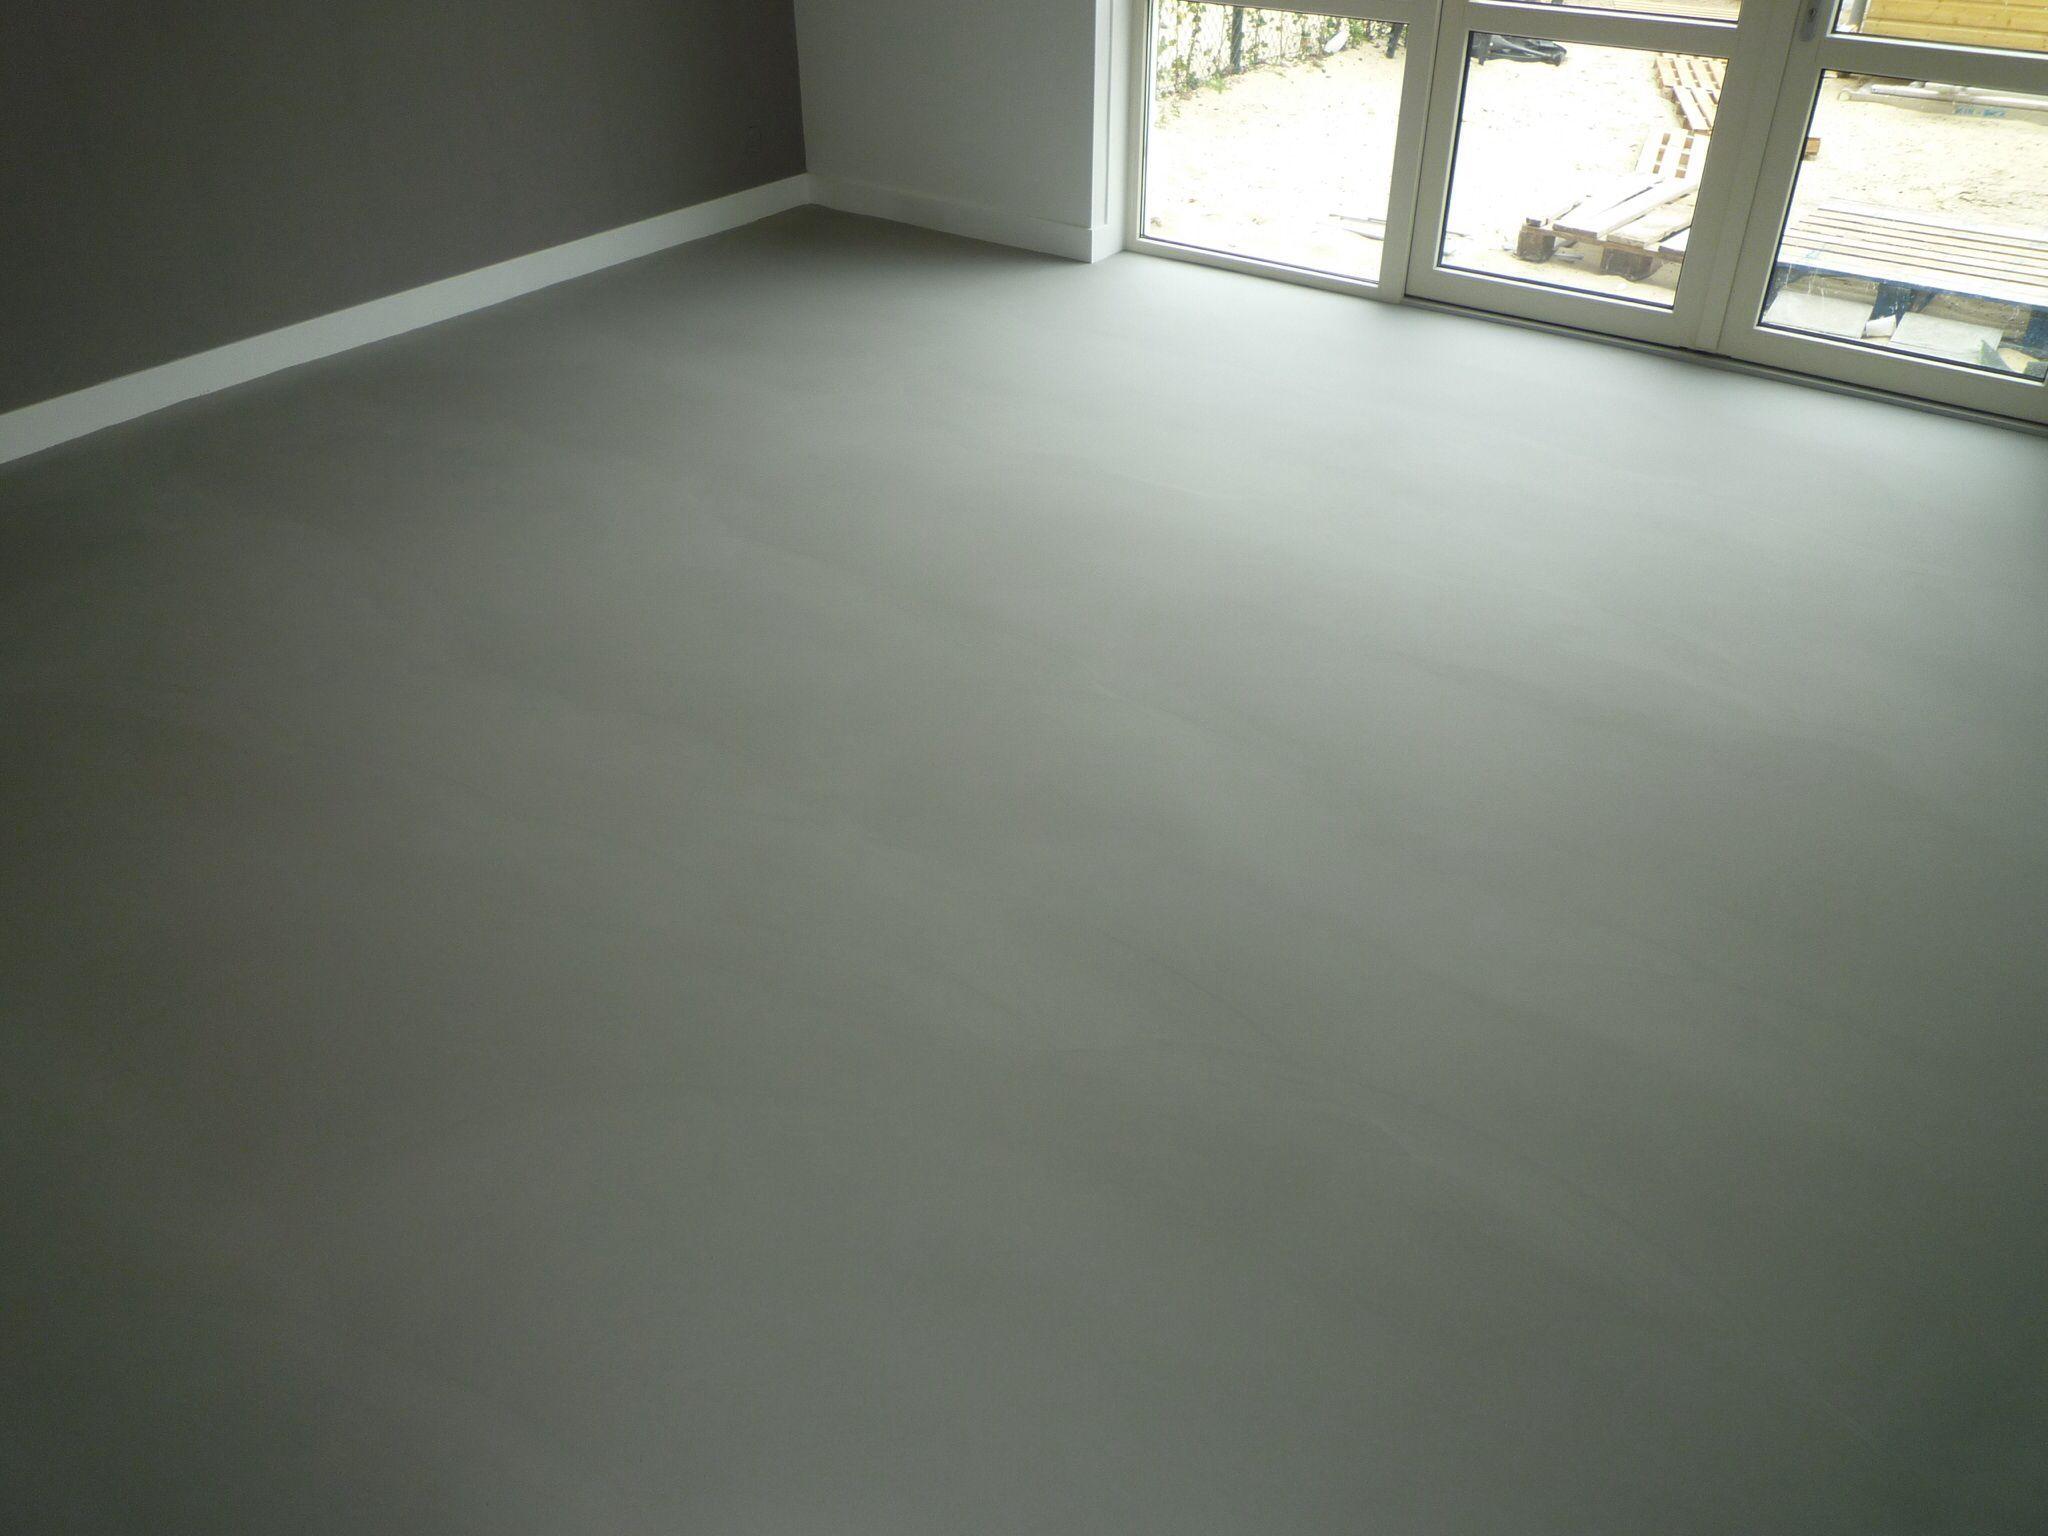 vloer beton cire vloeren beton cire pinterest concrete floor